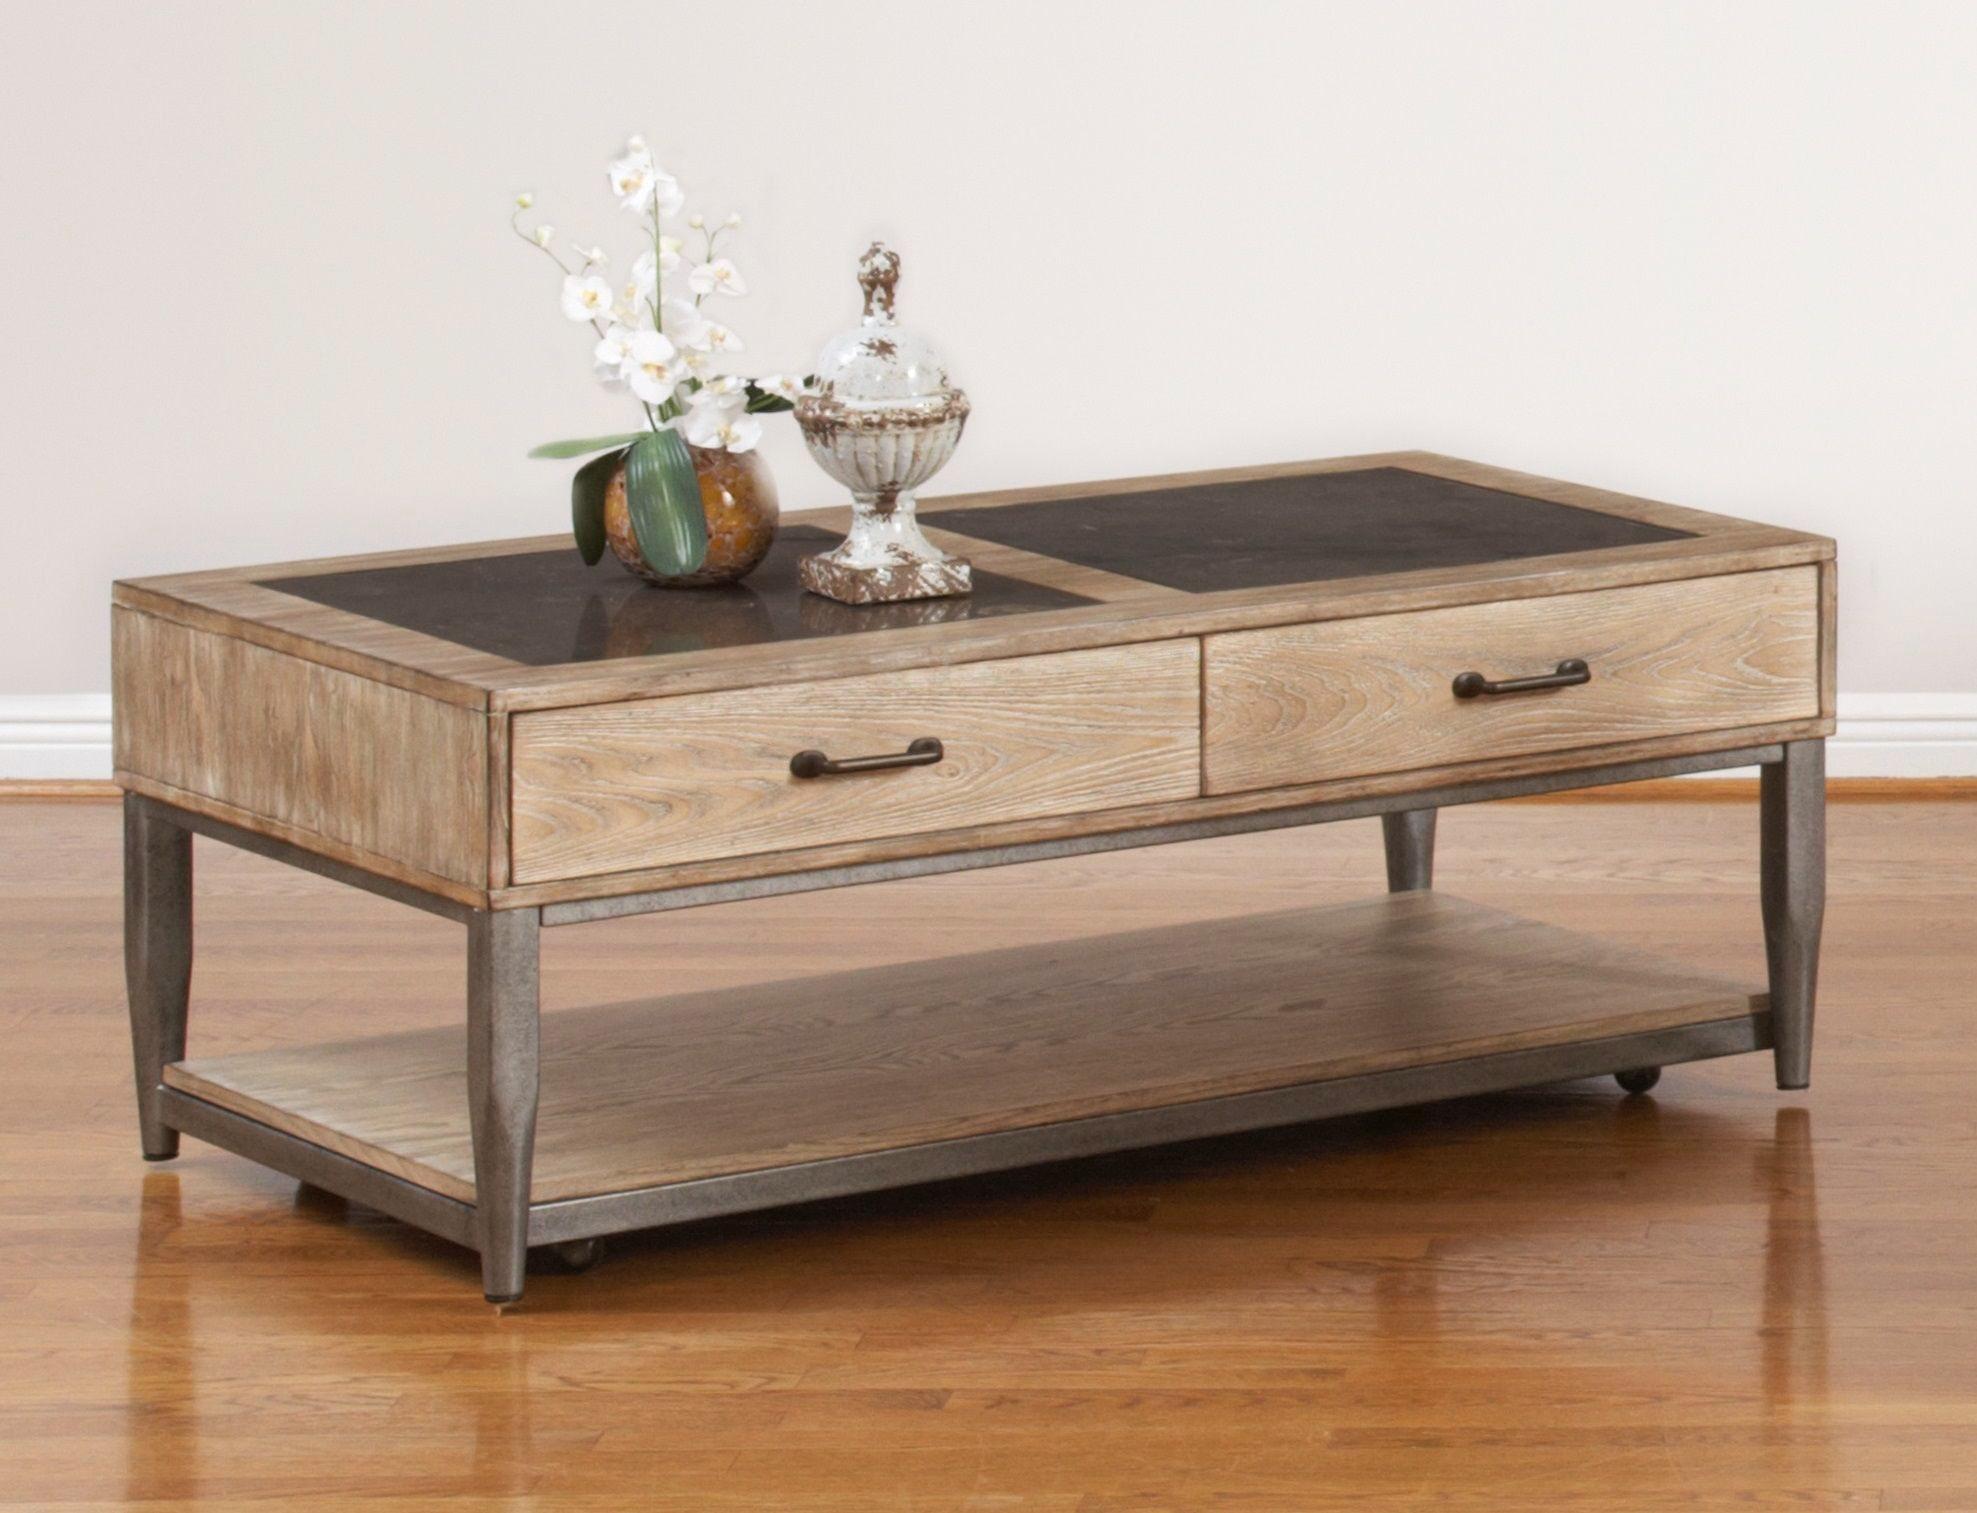 Merveilleux River Loft Coffee Table ST:495798